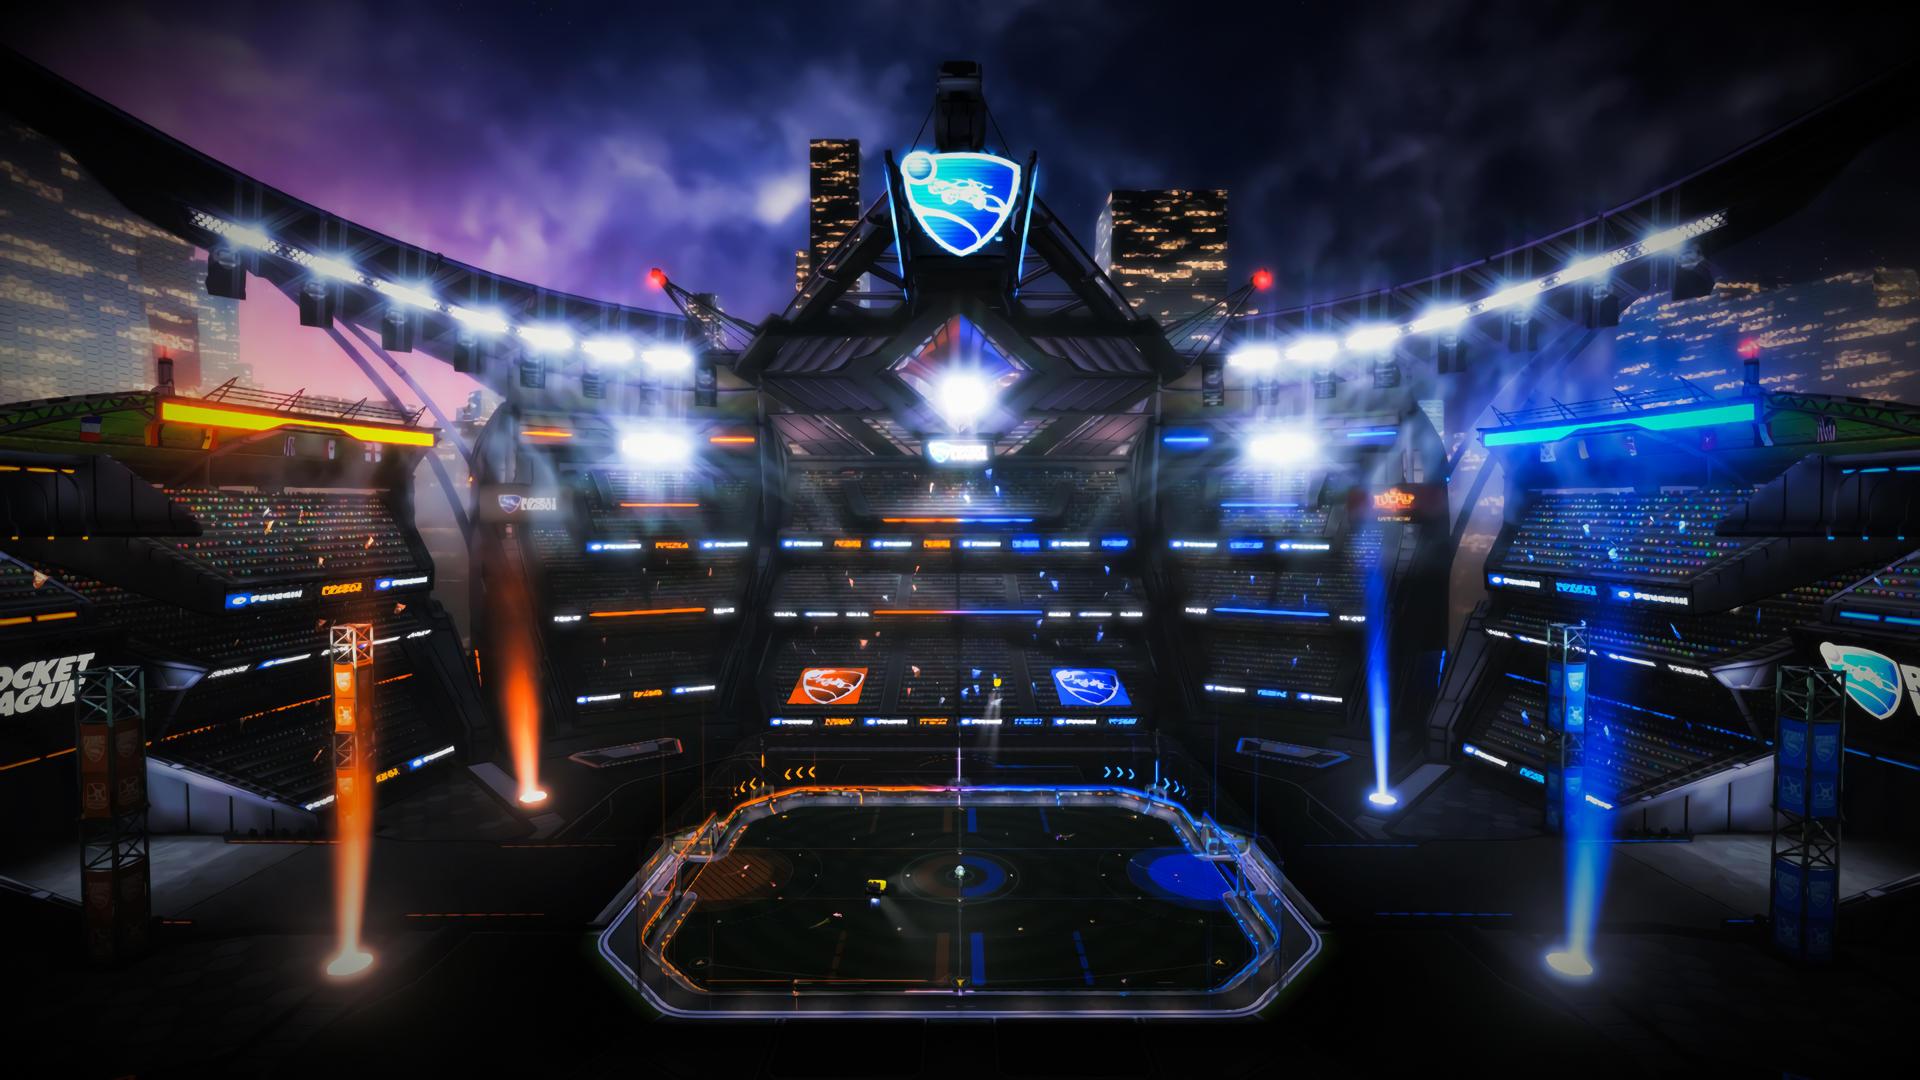 Champions Field Rocket League By Jazzyjusto On Deviantart